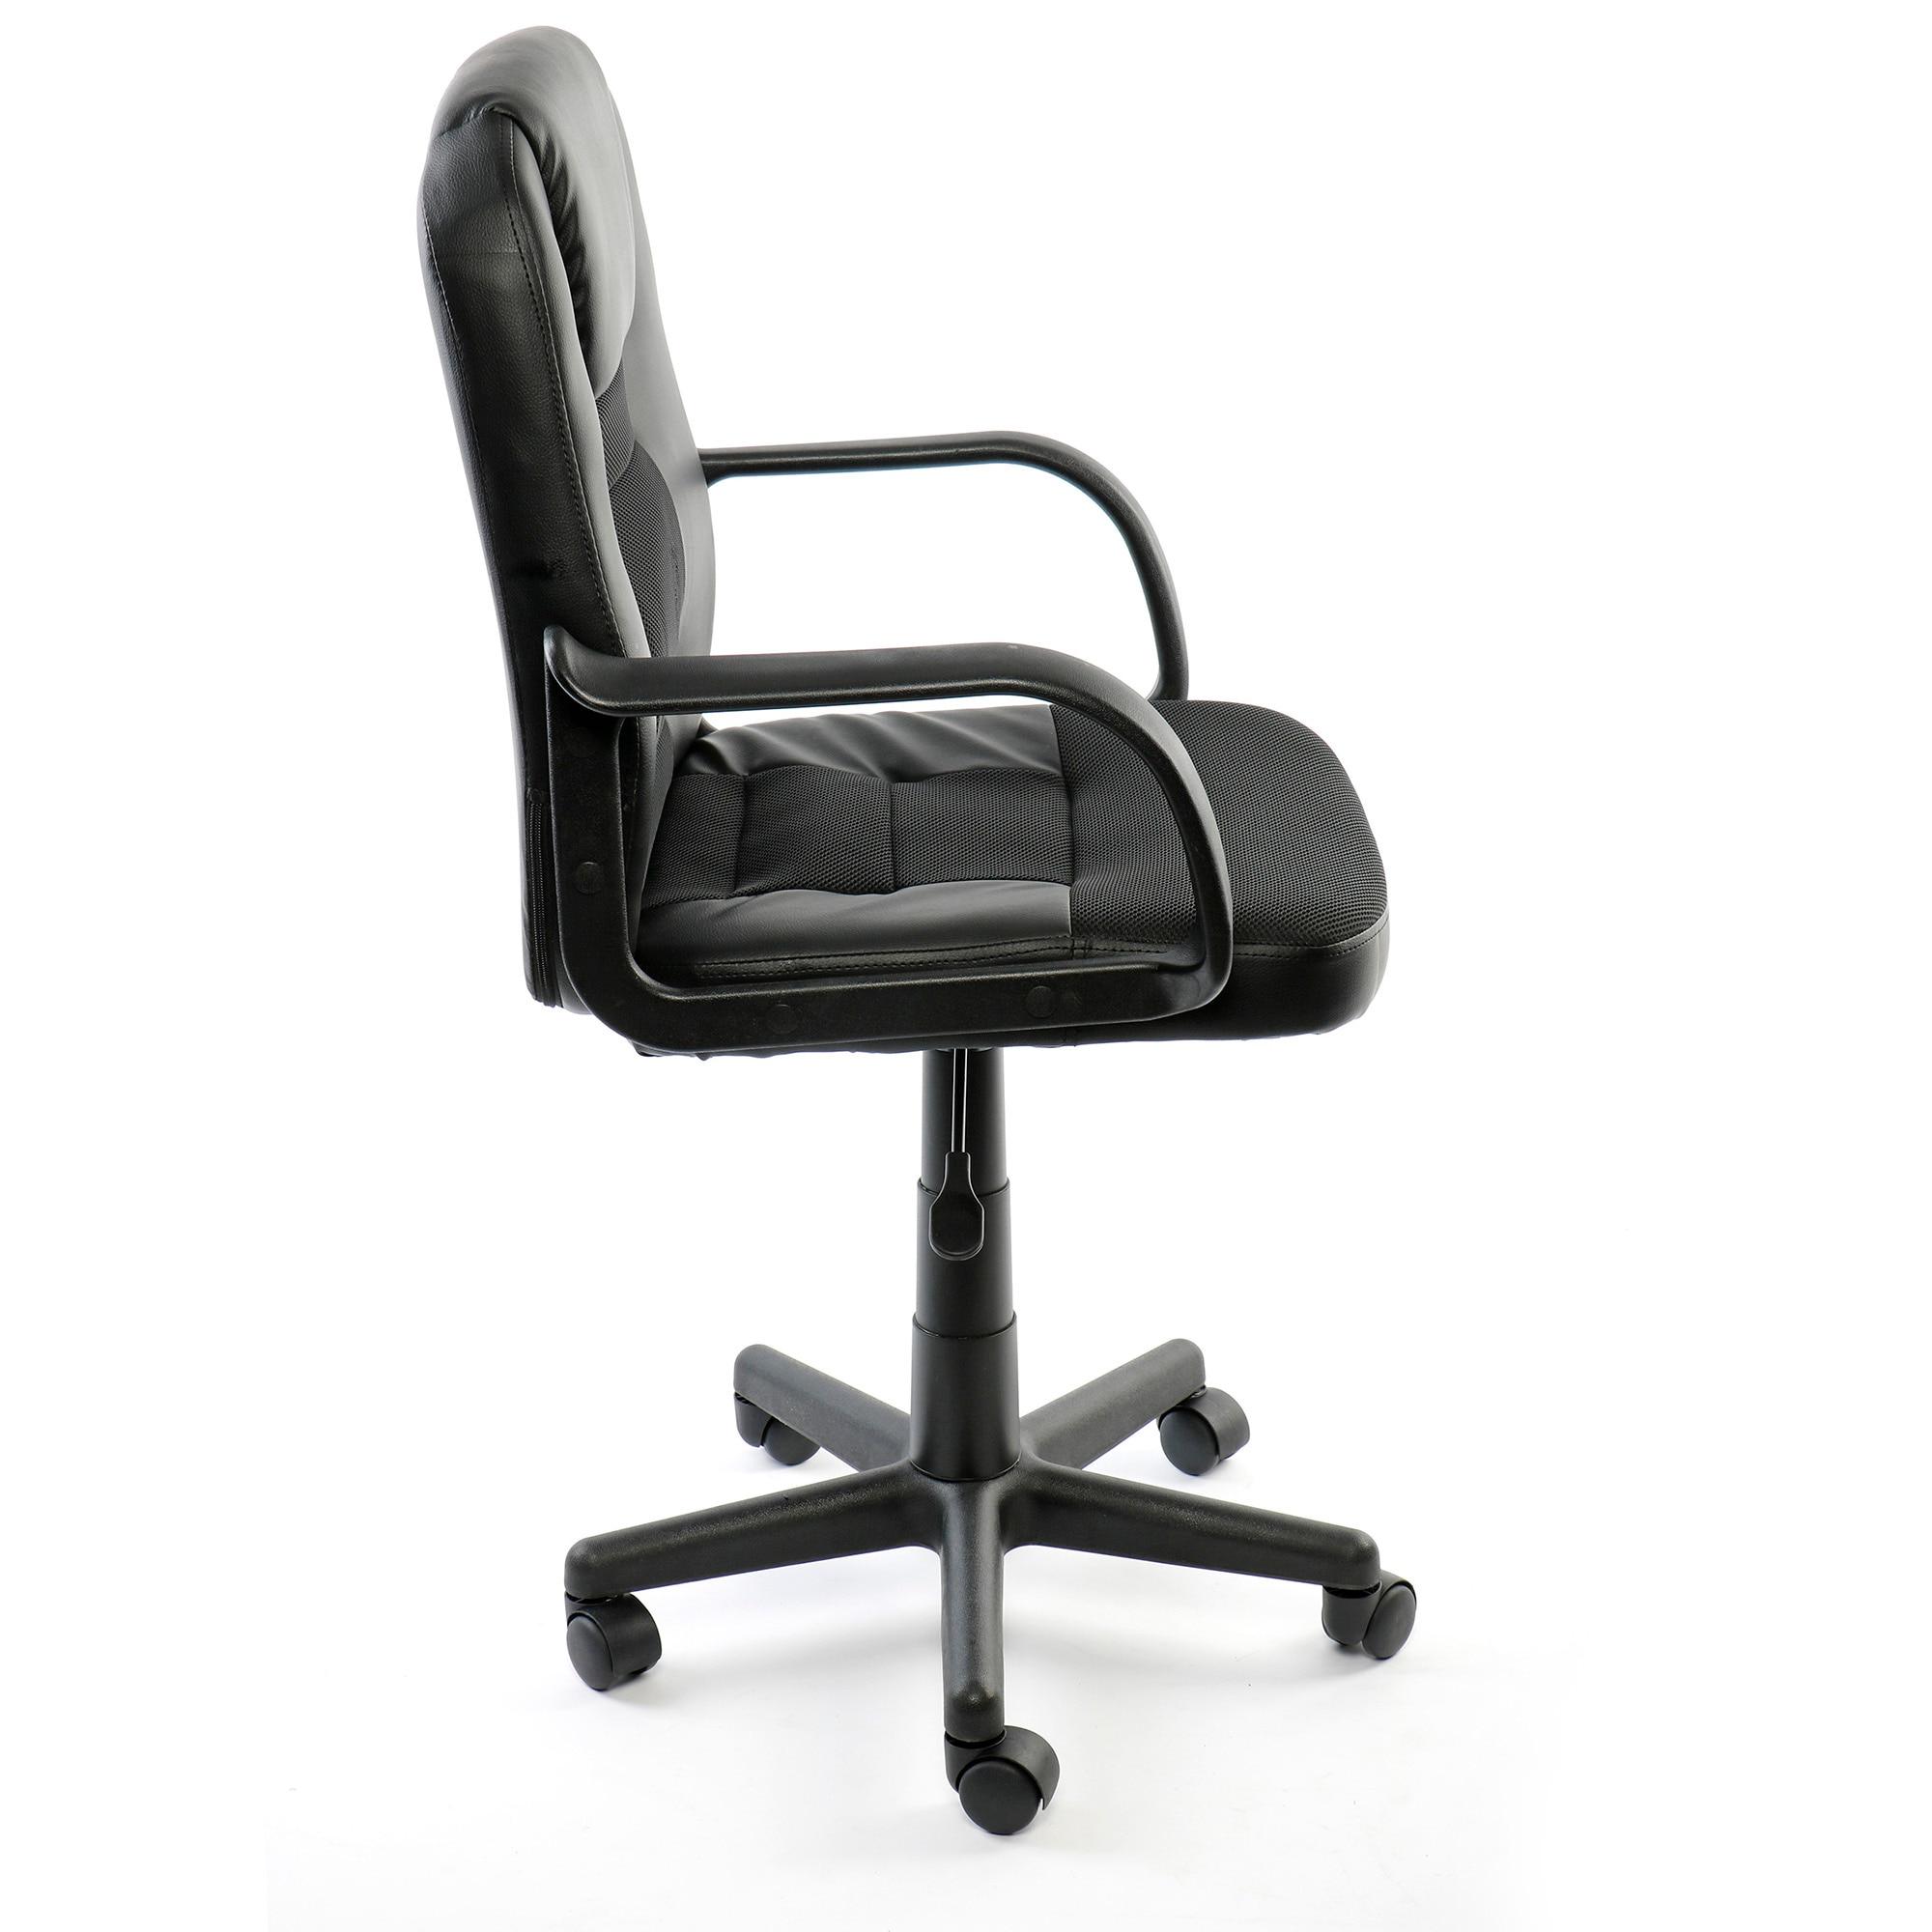 Kring Fortune Ergonomikus irodai szék, Poliuretán, Fekete